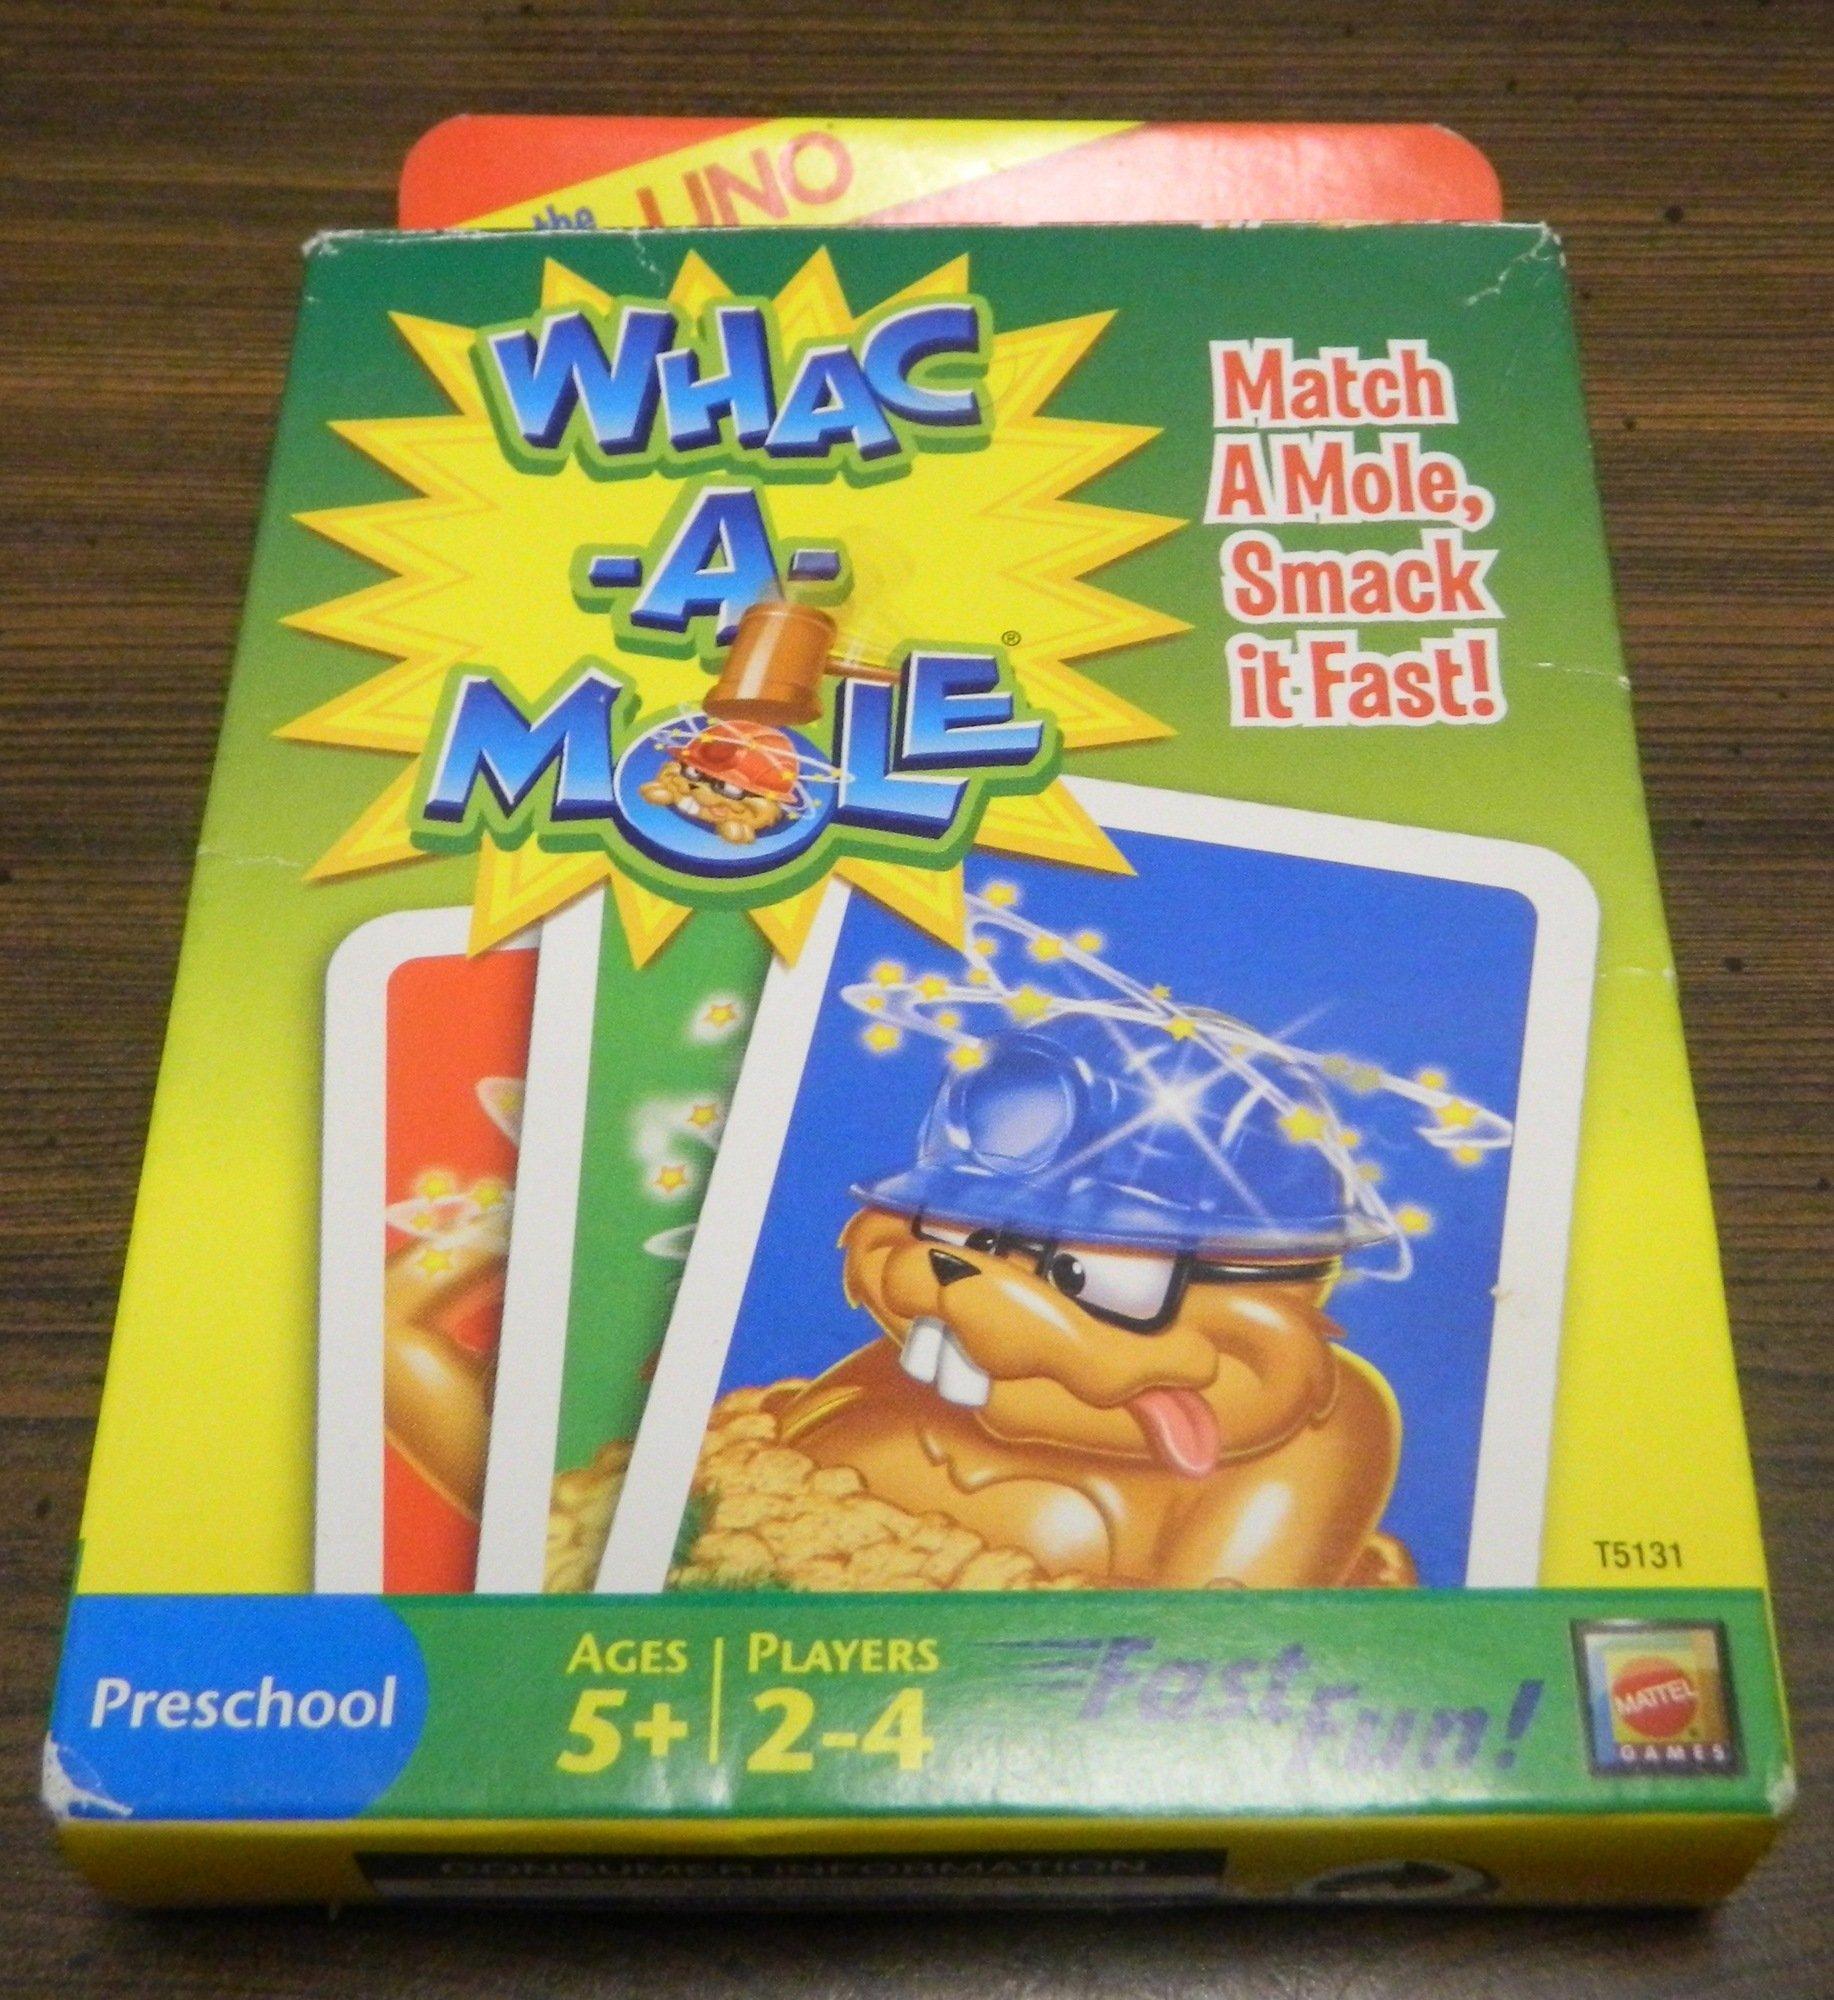 Box for Whac-A-Mole